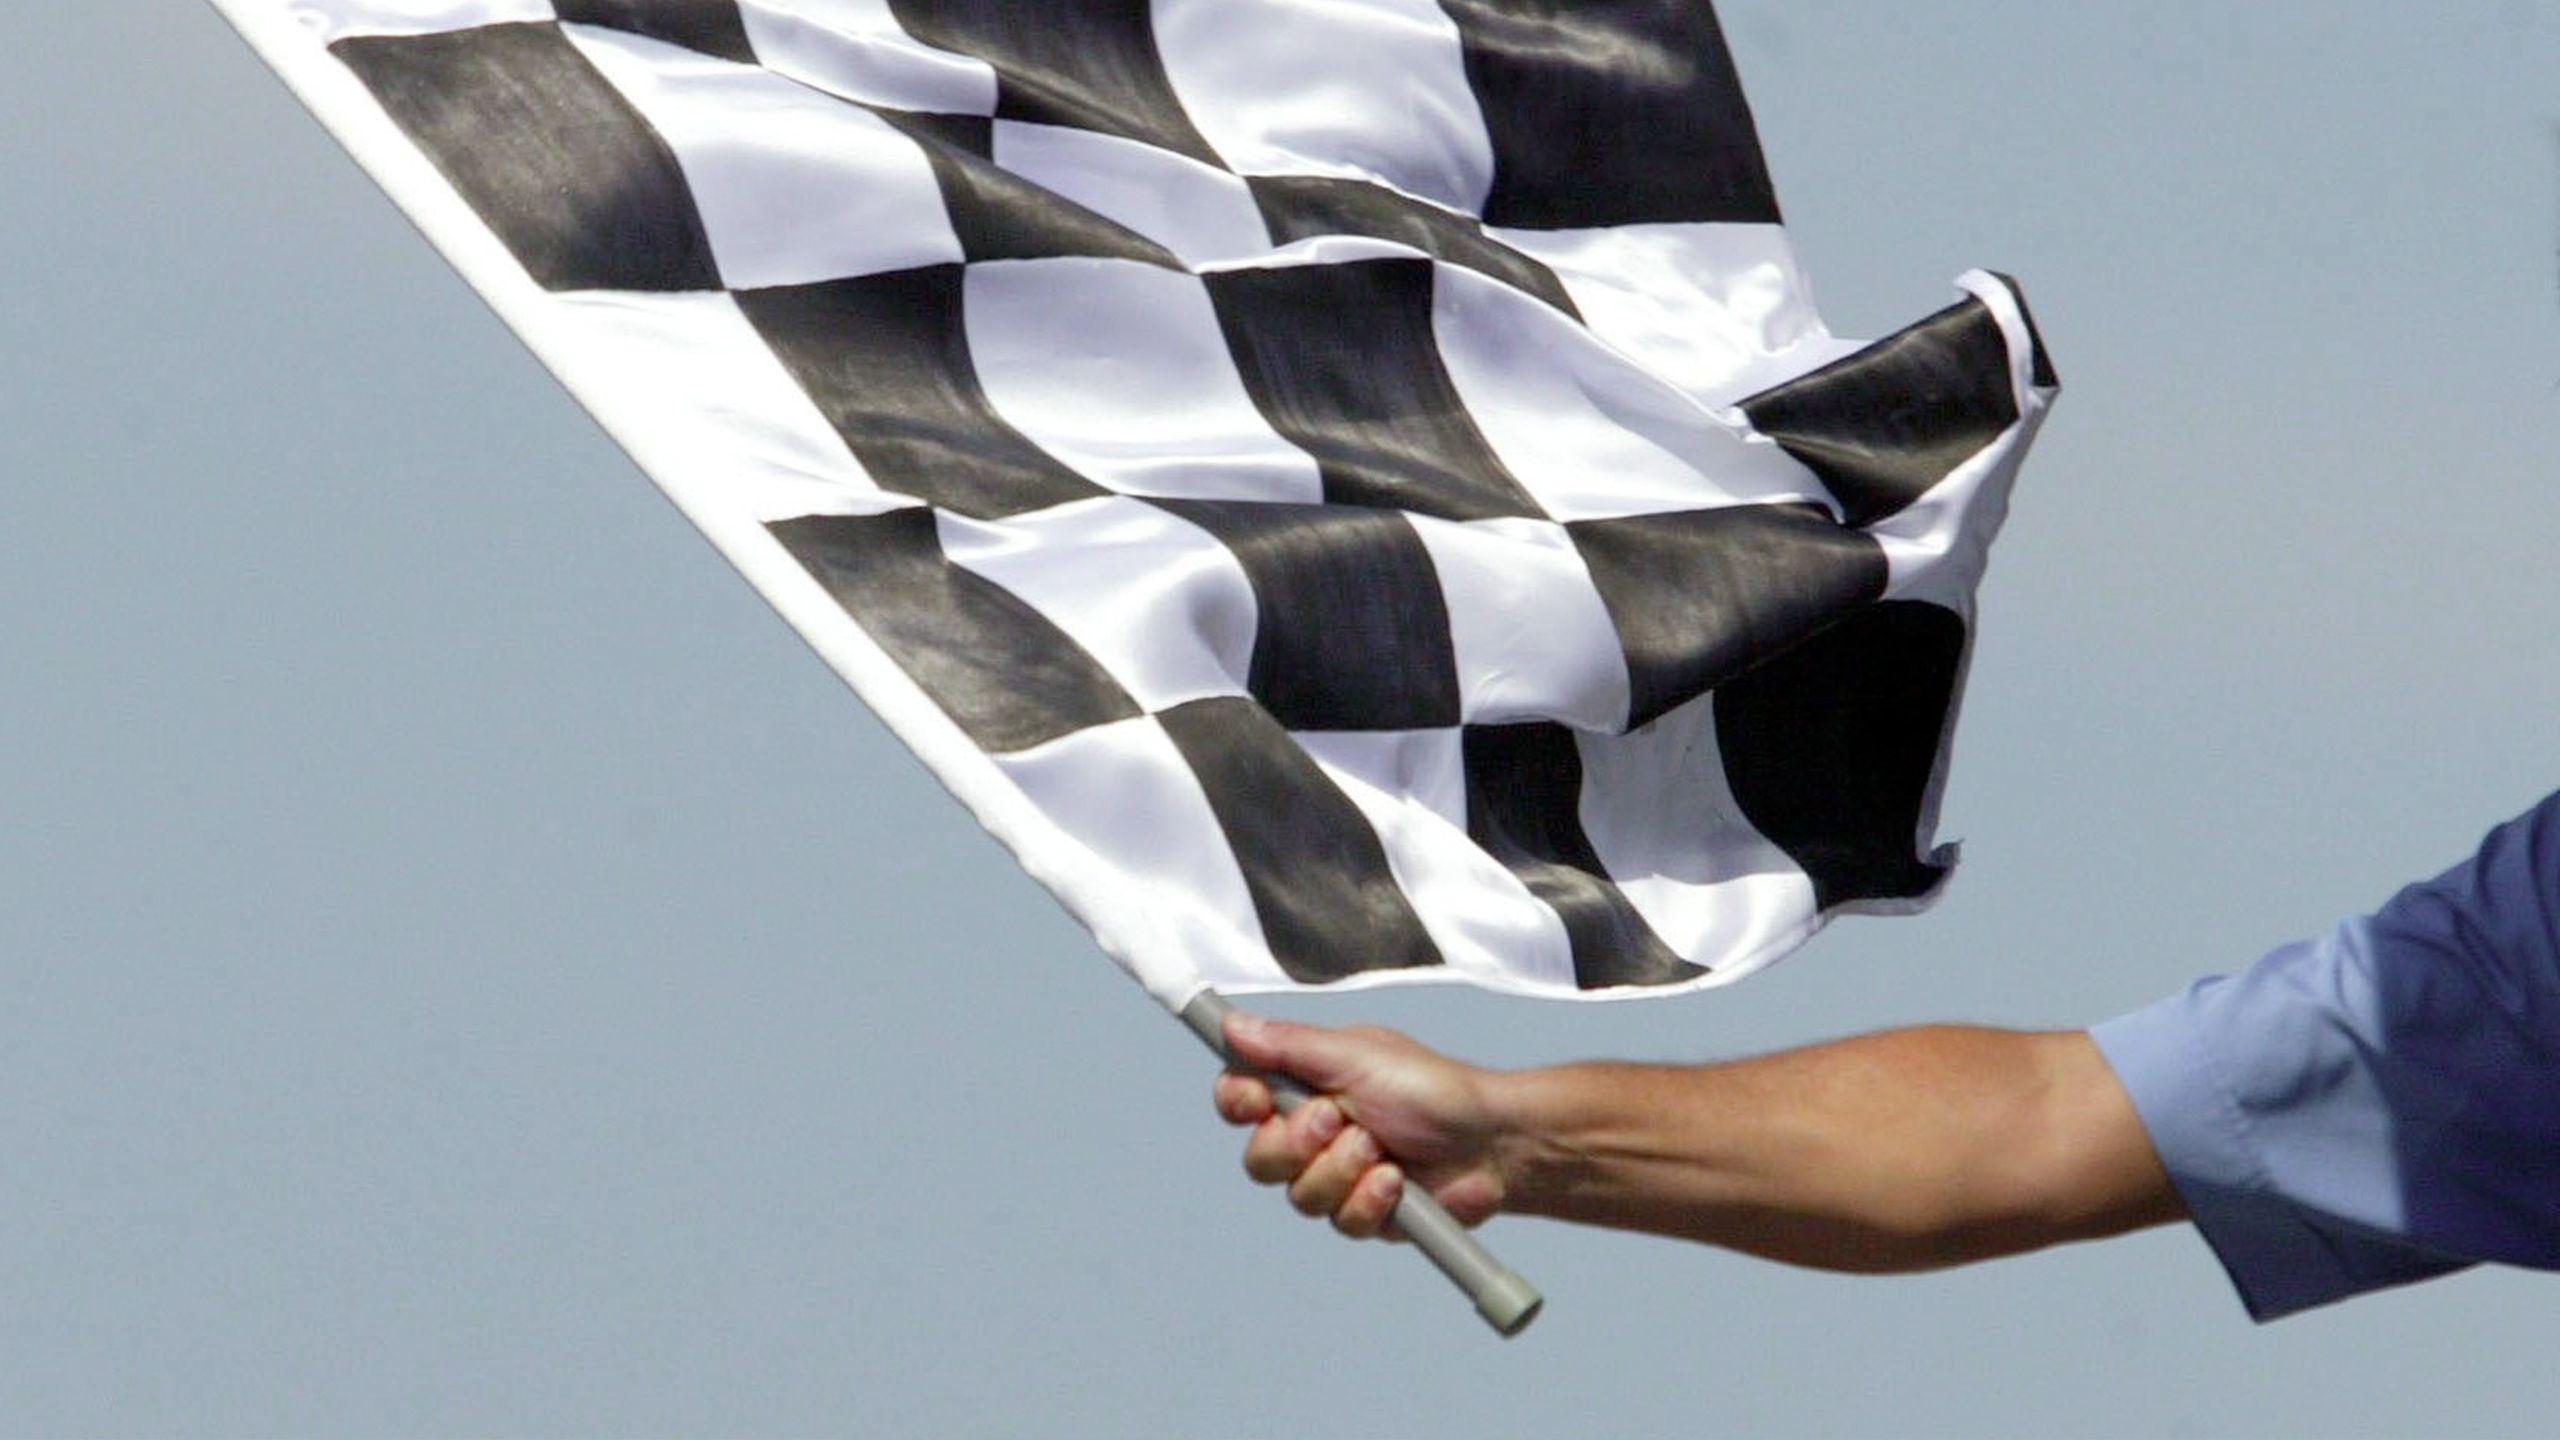 Formula 1 Rolex British Grand Prix coverage presented by Mothers Polish